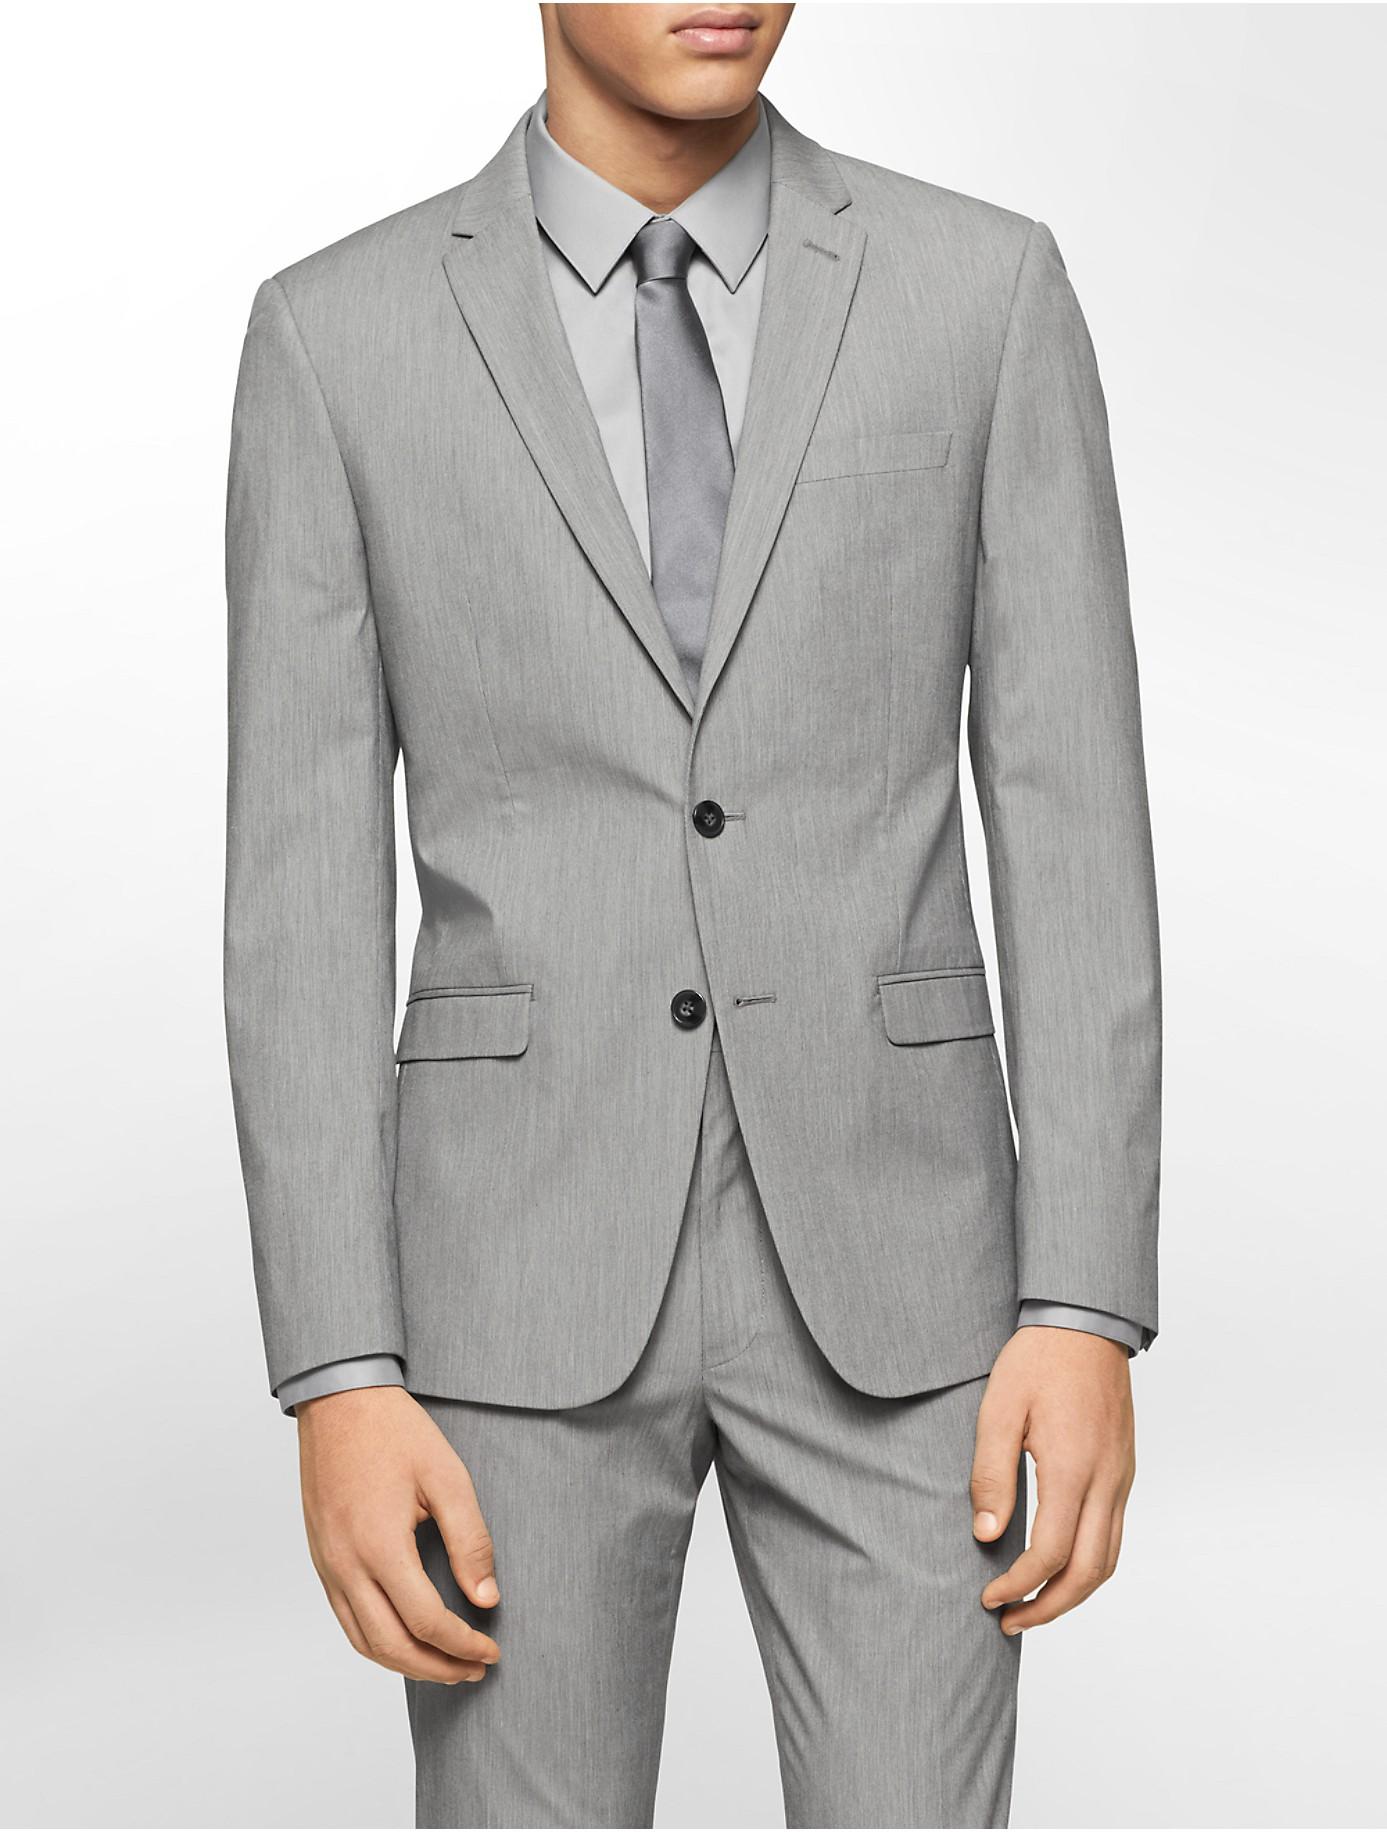 Calvin klein white label x fit ultra slim fit silver fine for Calvin klein x fit dress shirt